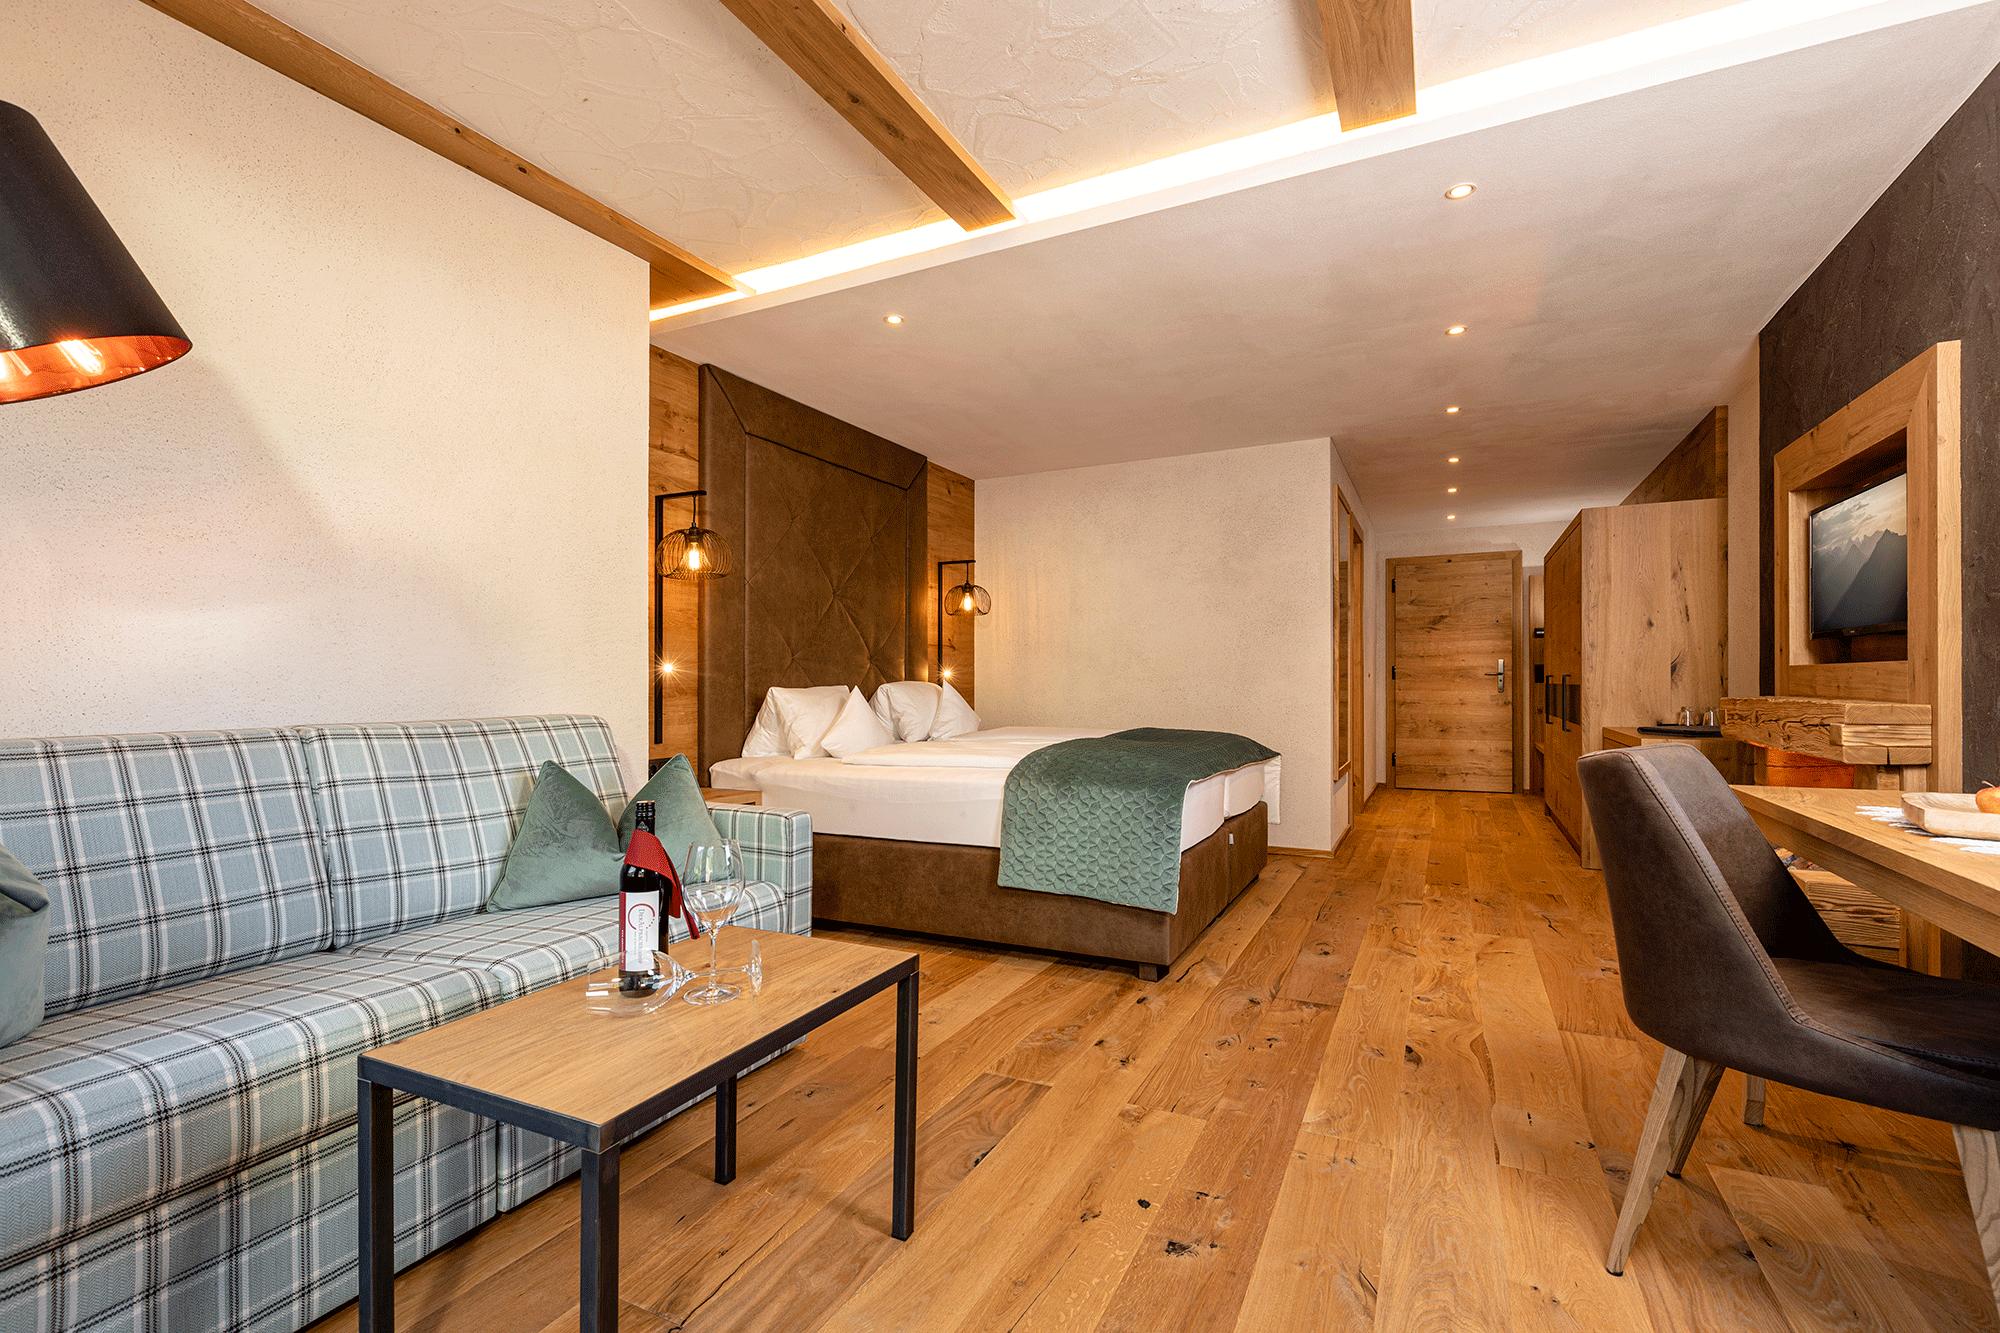 Wohnkomfortzimmer Romantik mit Sitzgelegenheit im Wellnesshotel Alpbacherhof nahe des Skigebiets Ski Juwel